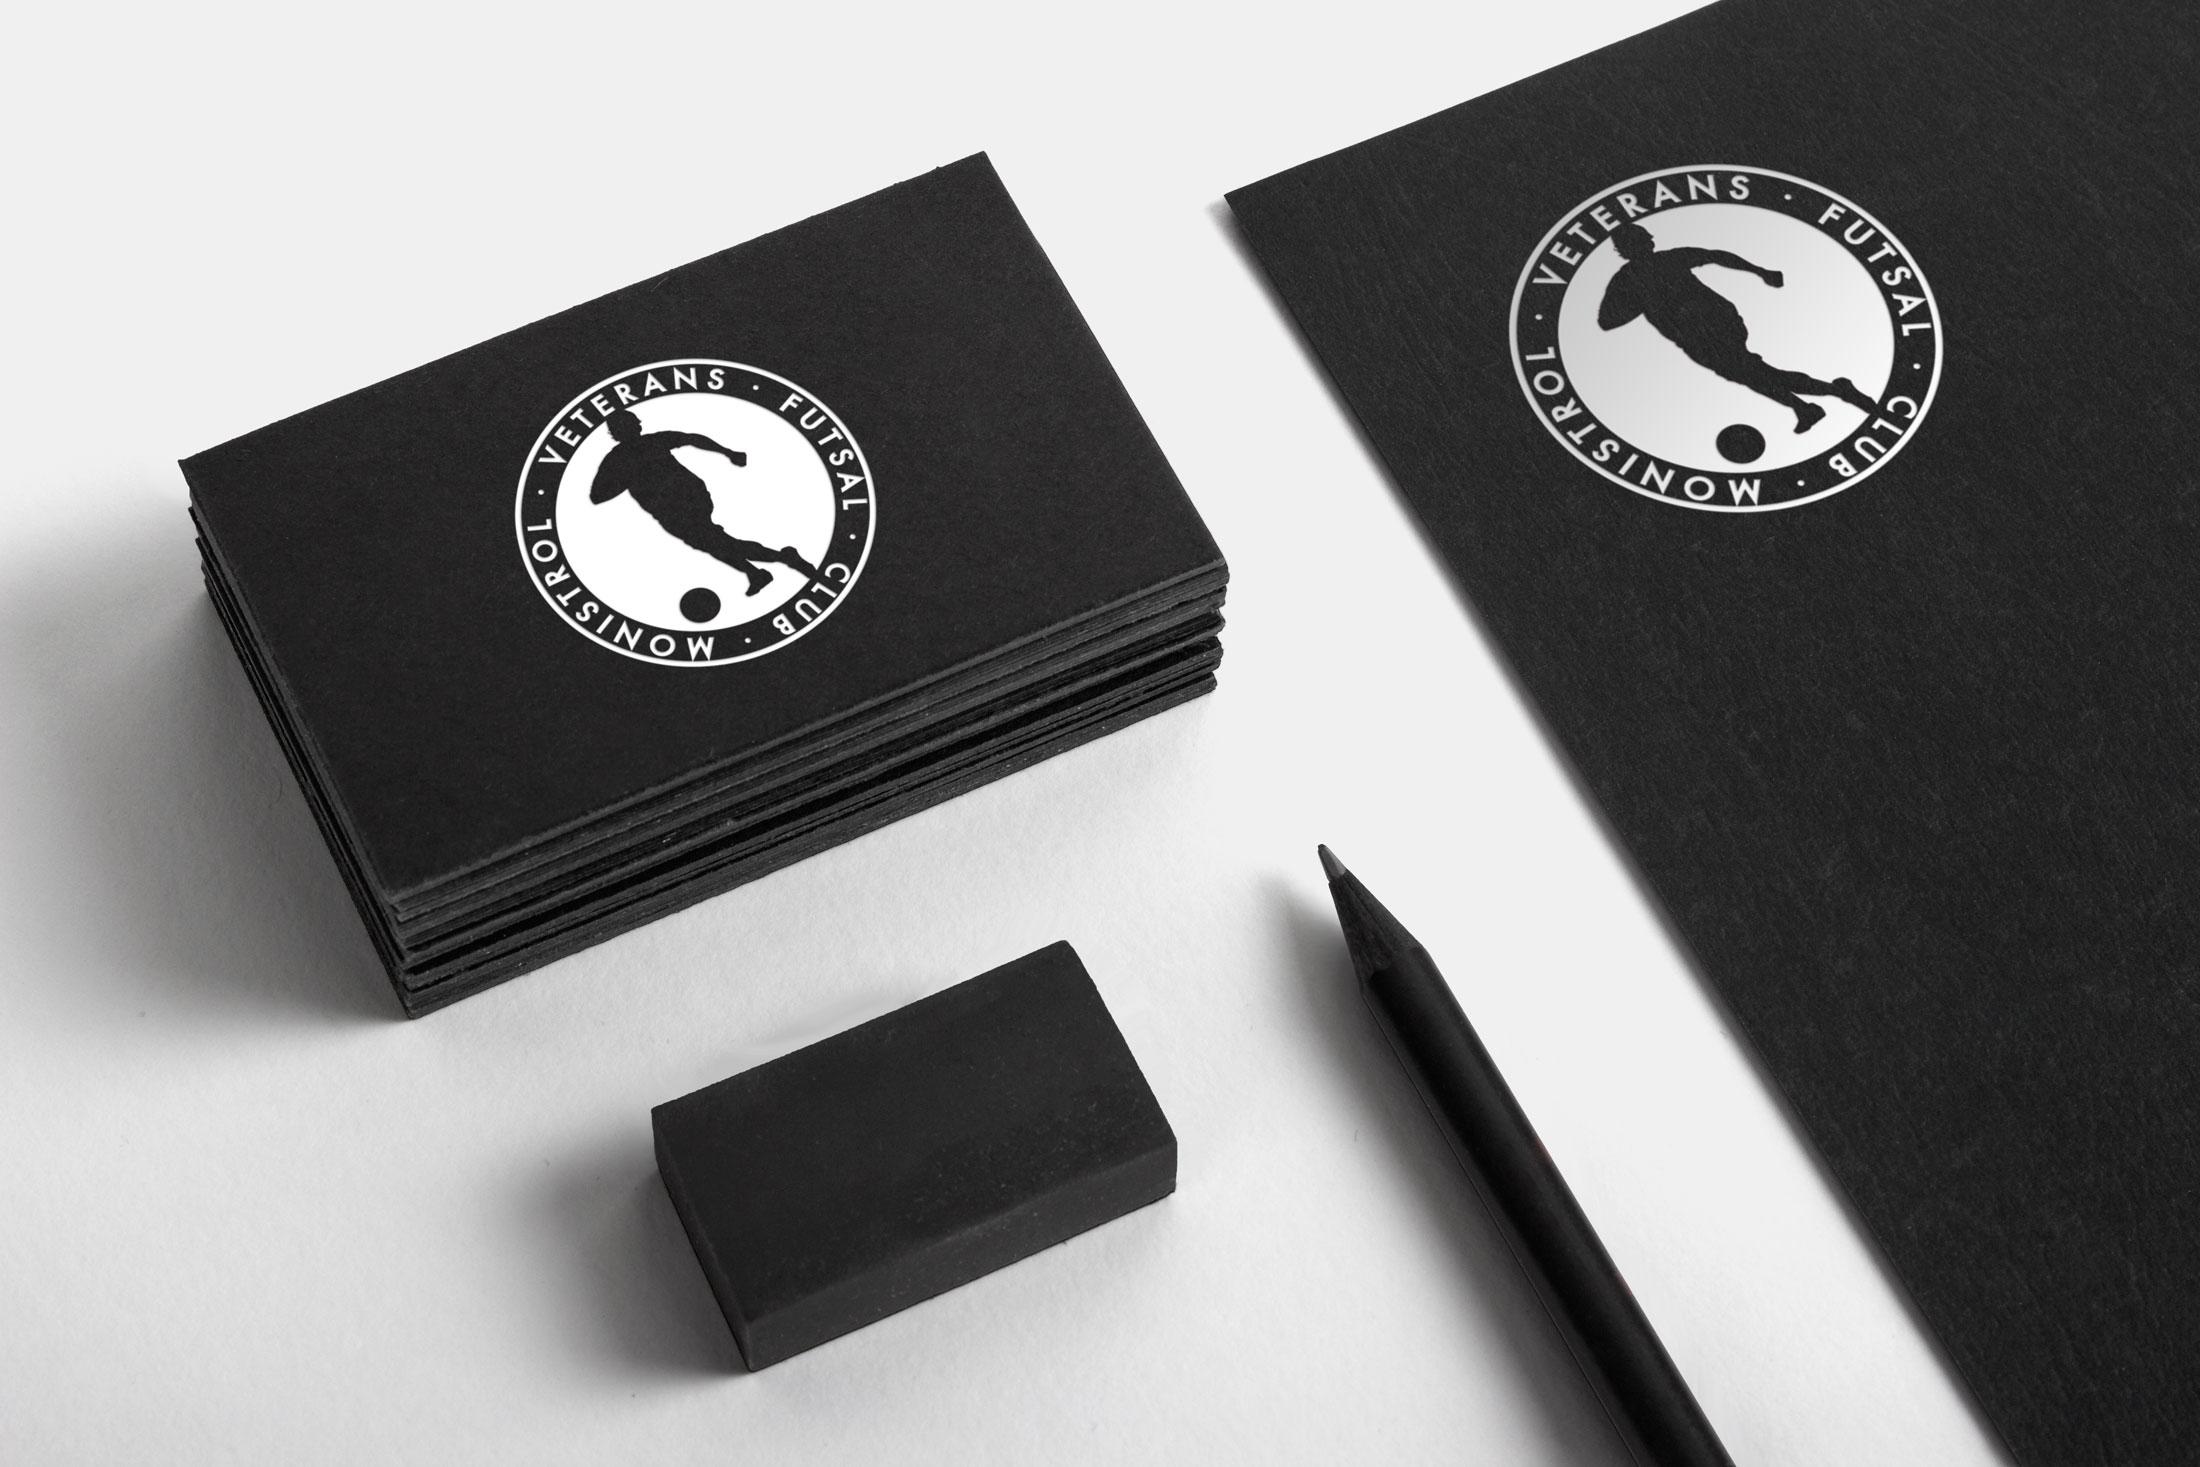 Monistrol-veterand-futsal-branding-disseny-gerard-juher-01